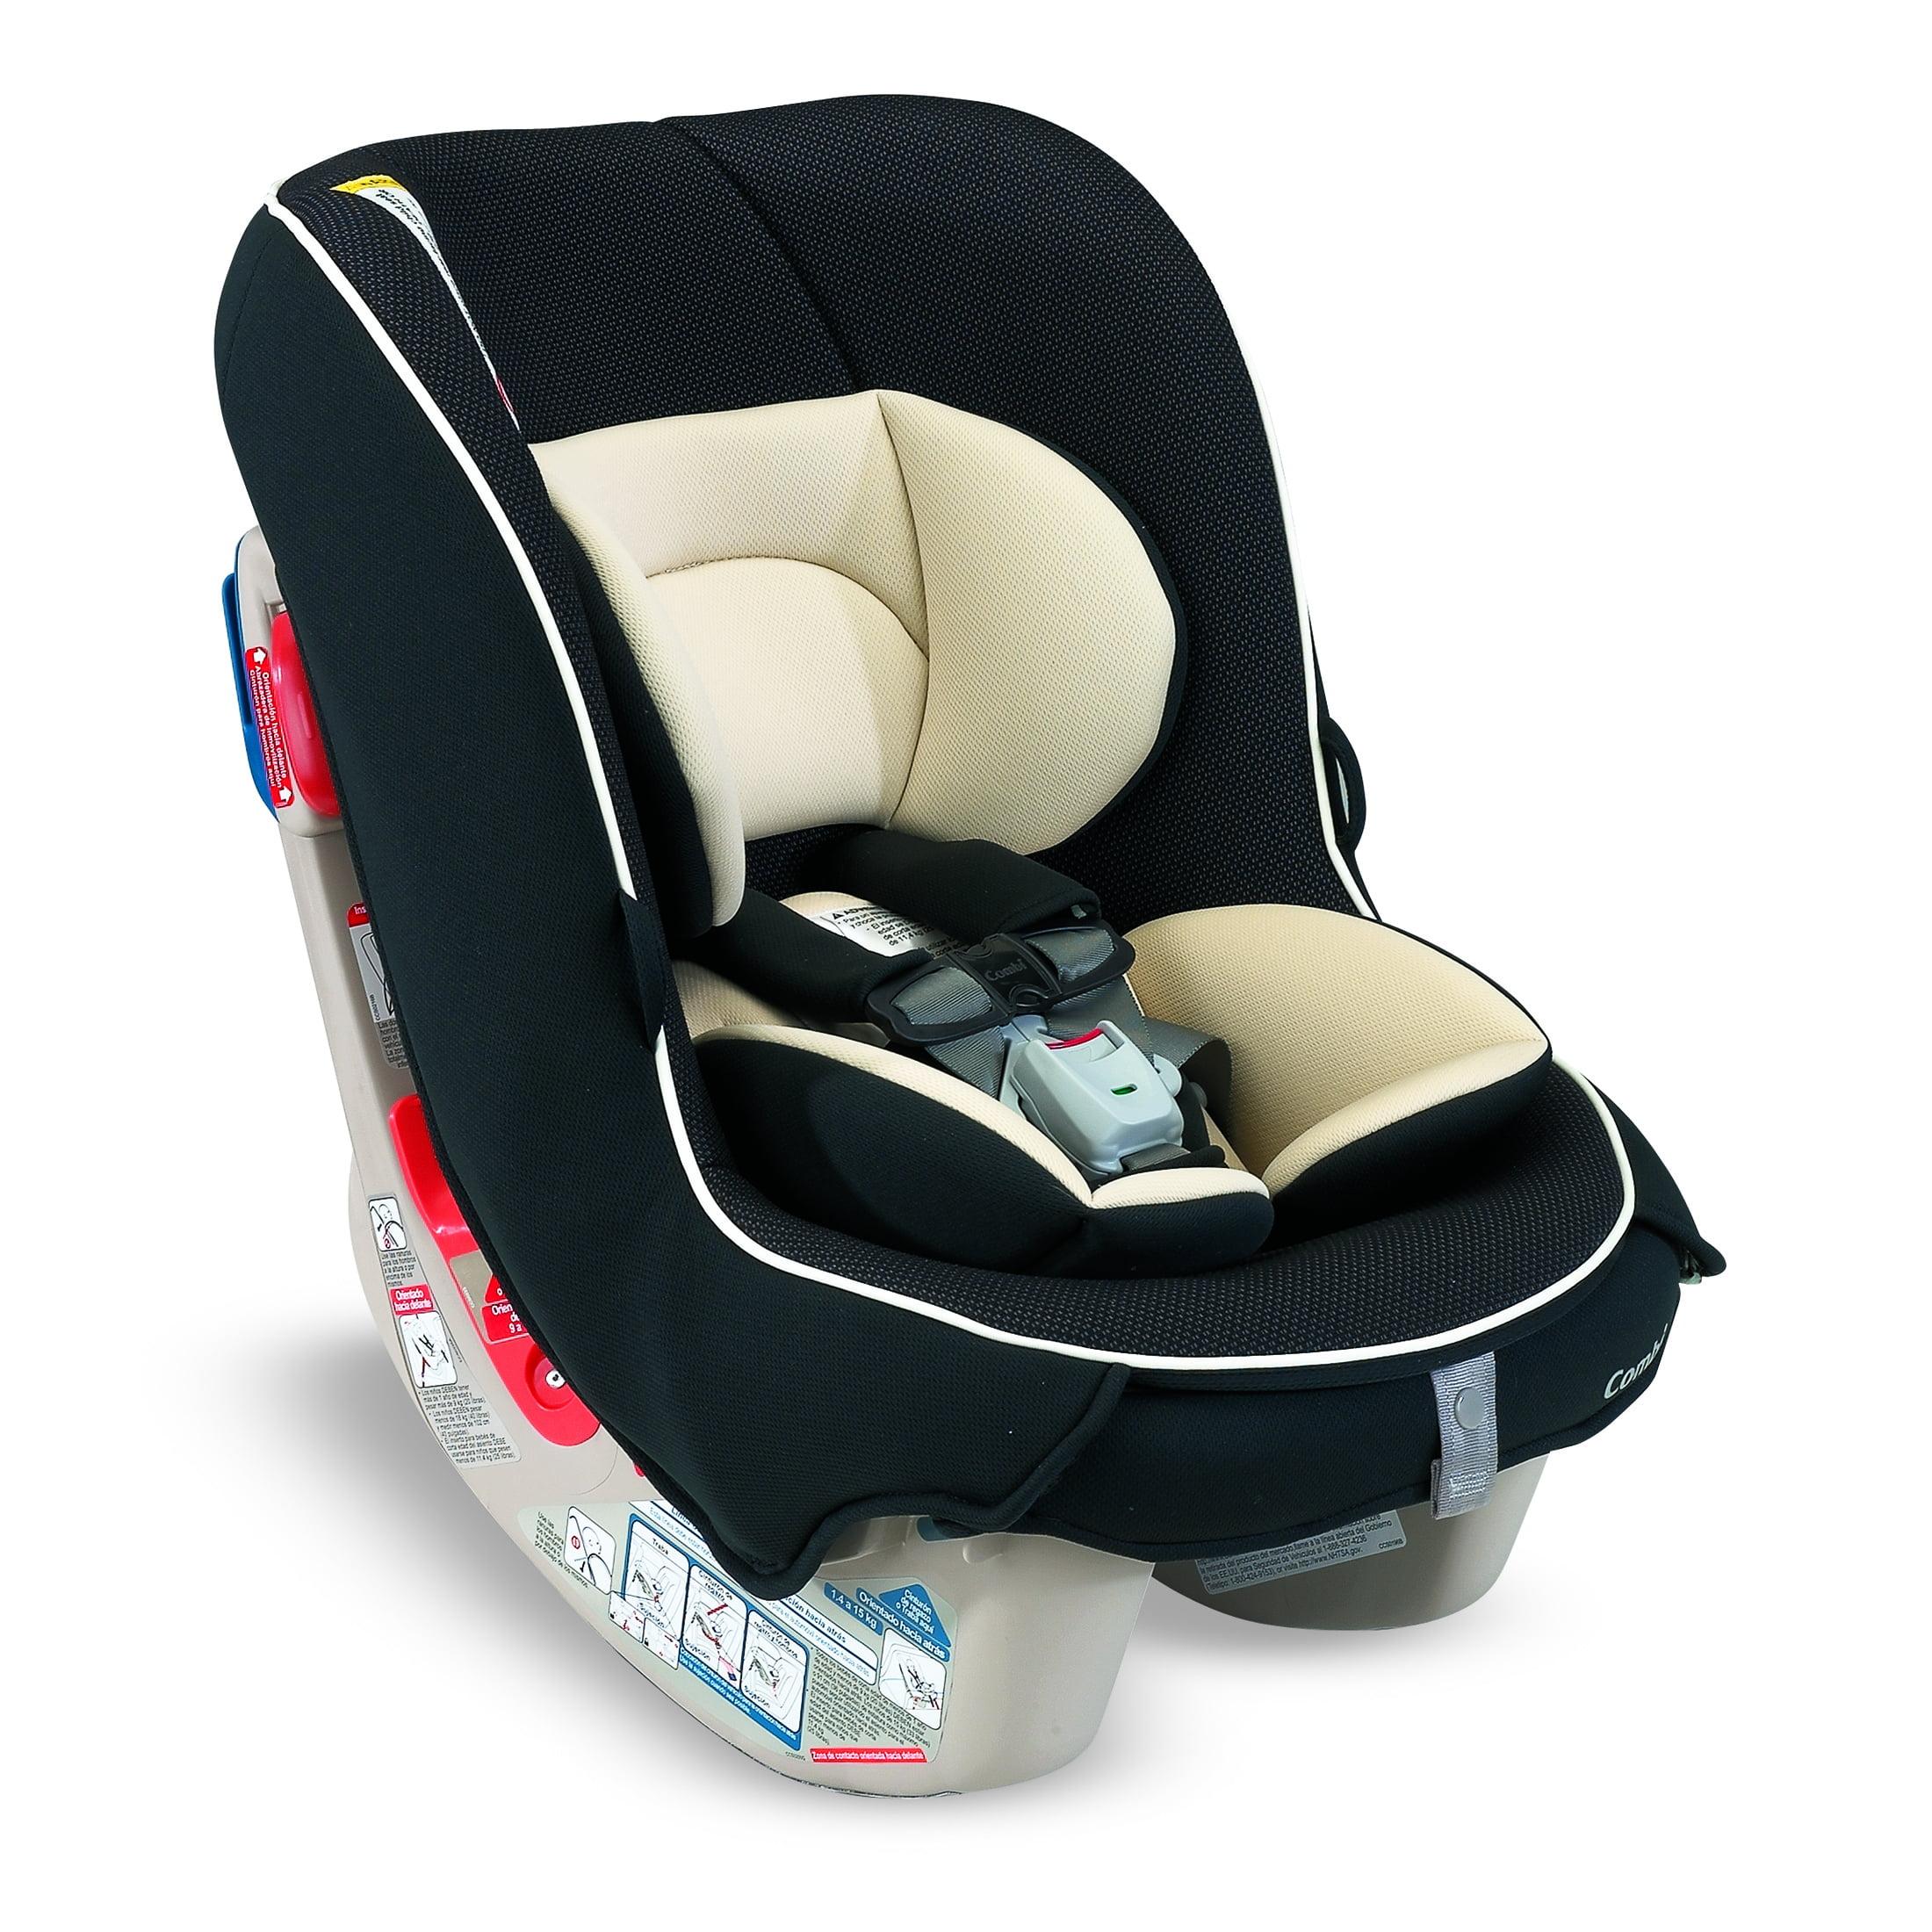 Combi Coccoro Convertible Car Seat, Choose Your Color